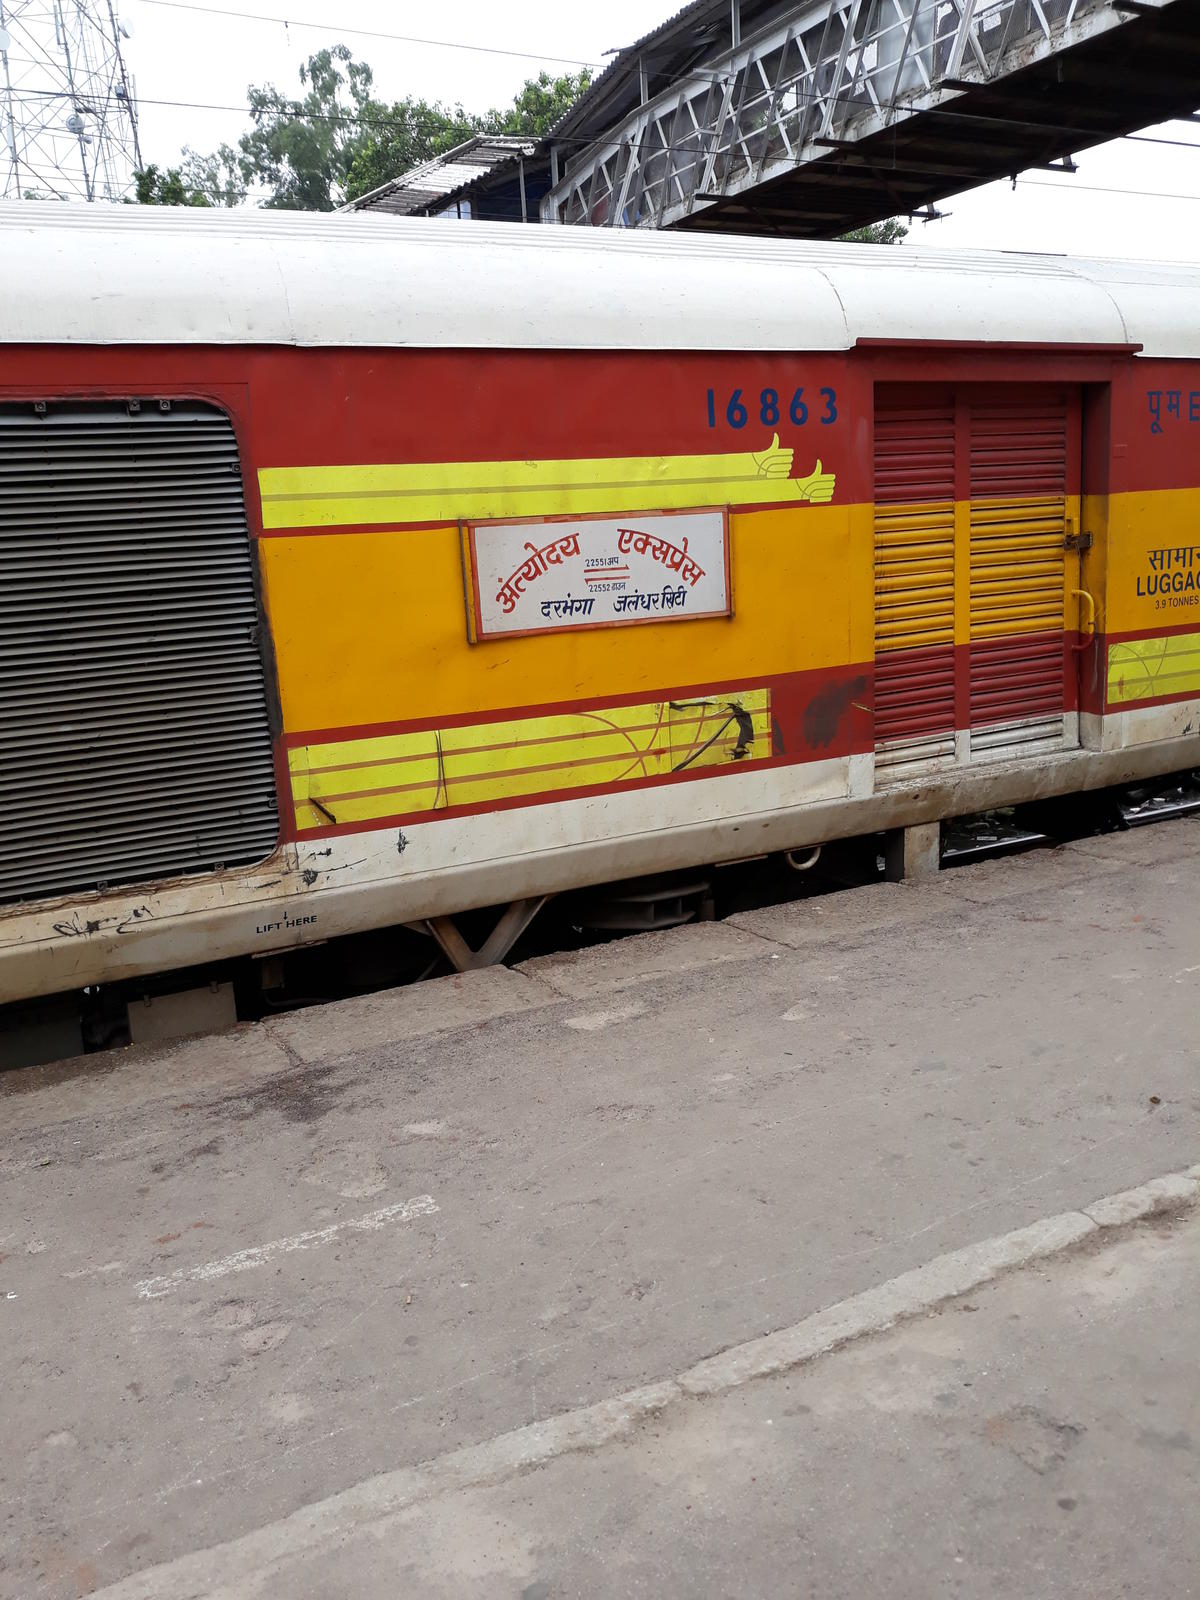 22552/Jalandhar City - Darbhanga Antyodaya Express